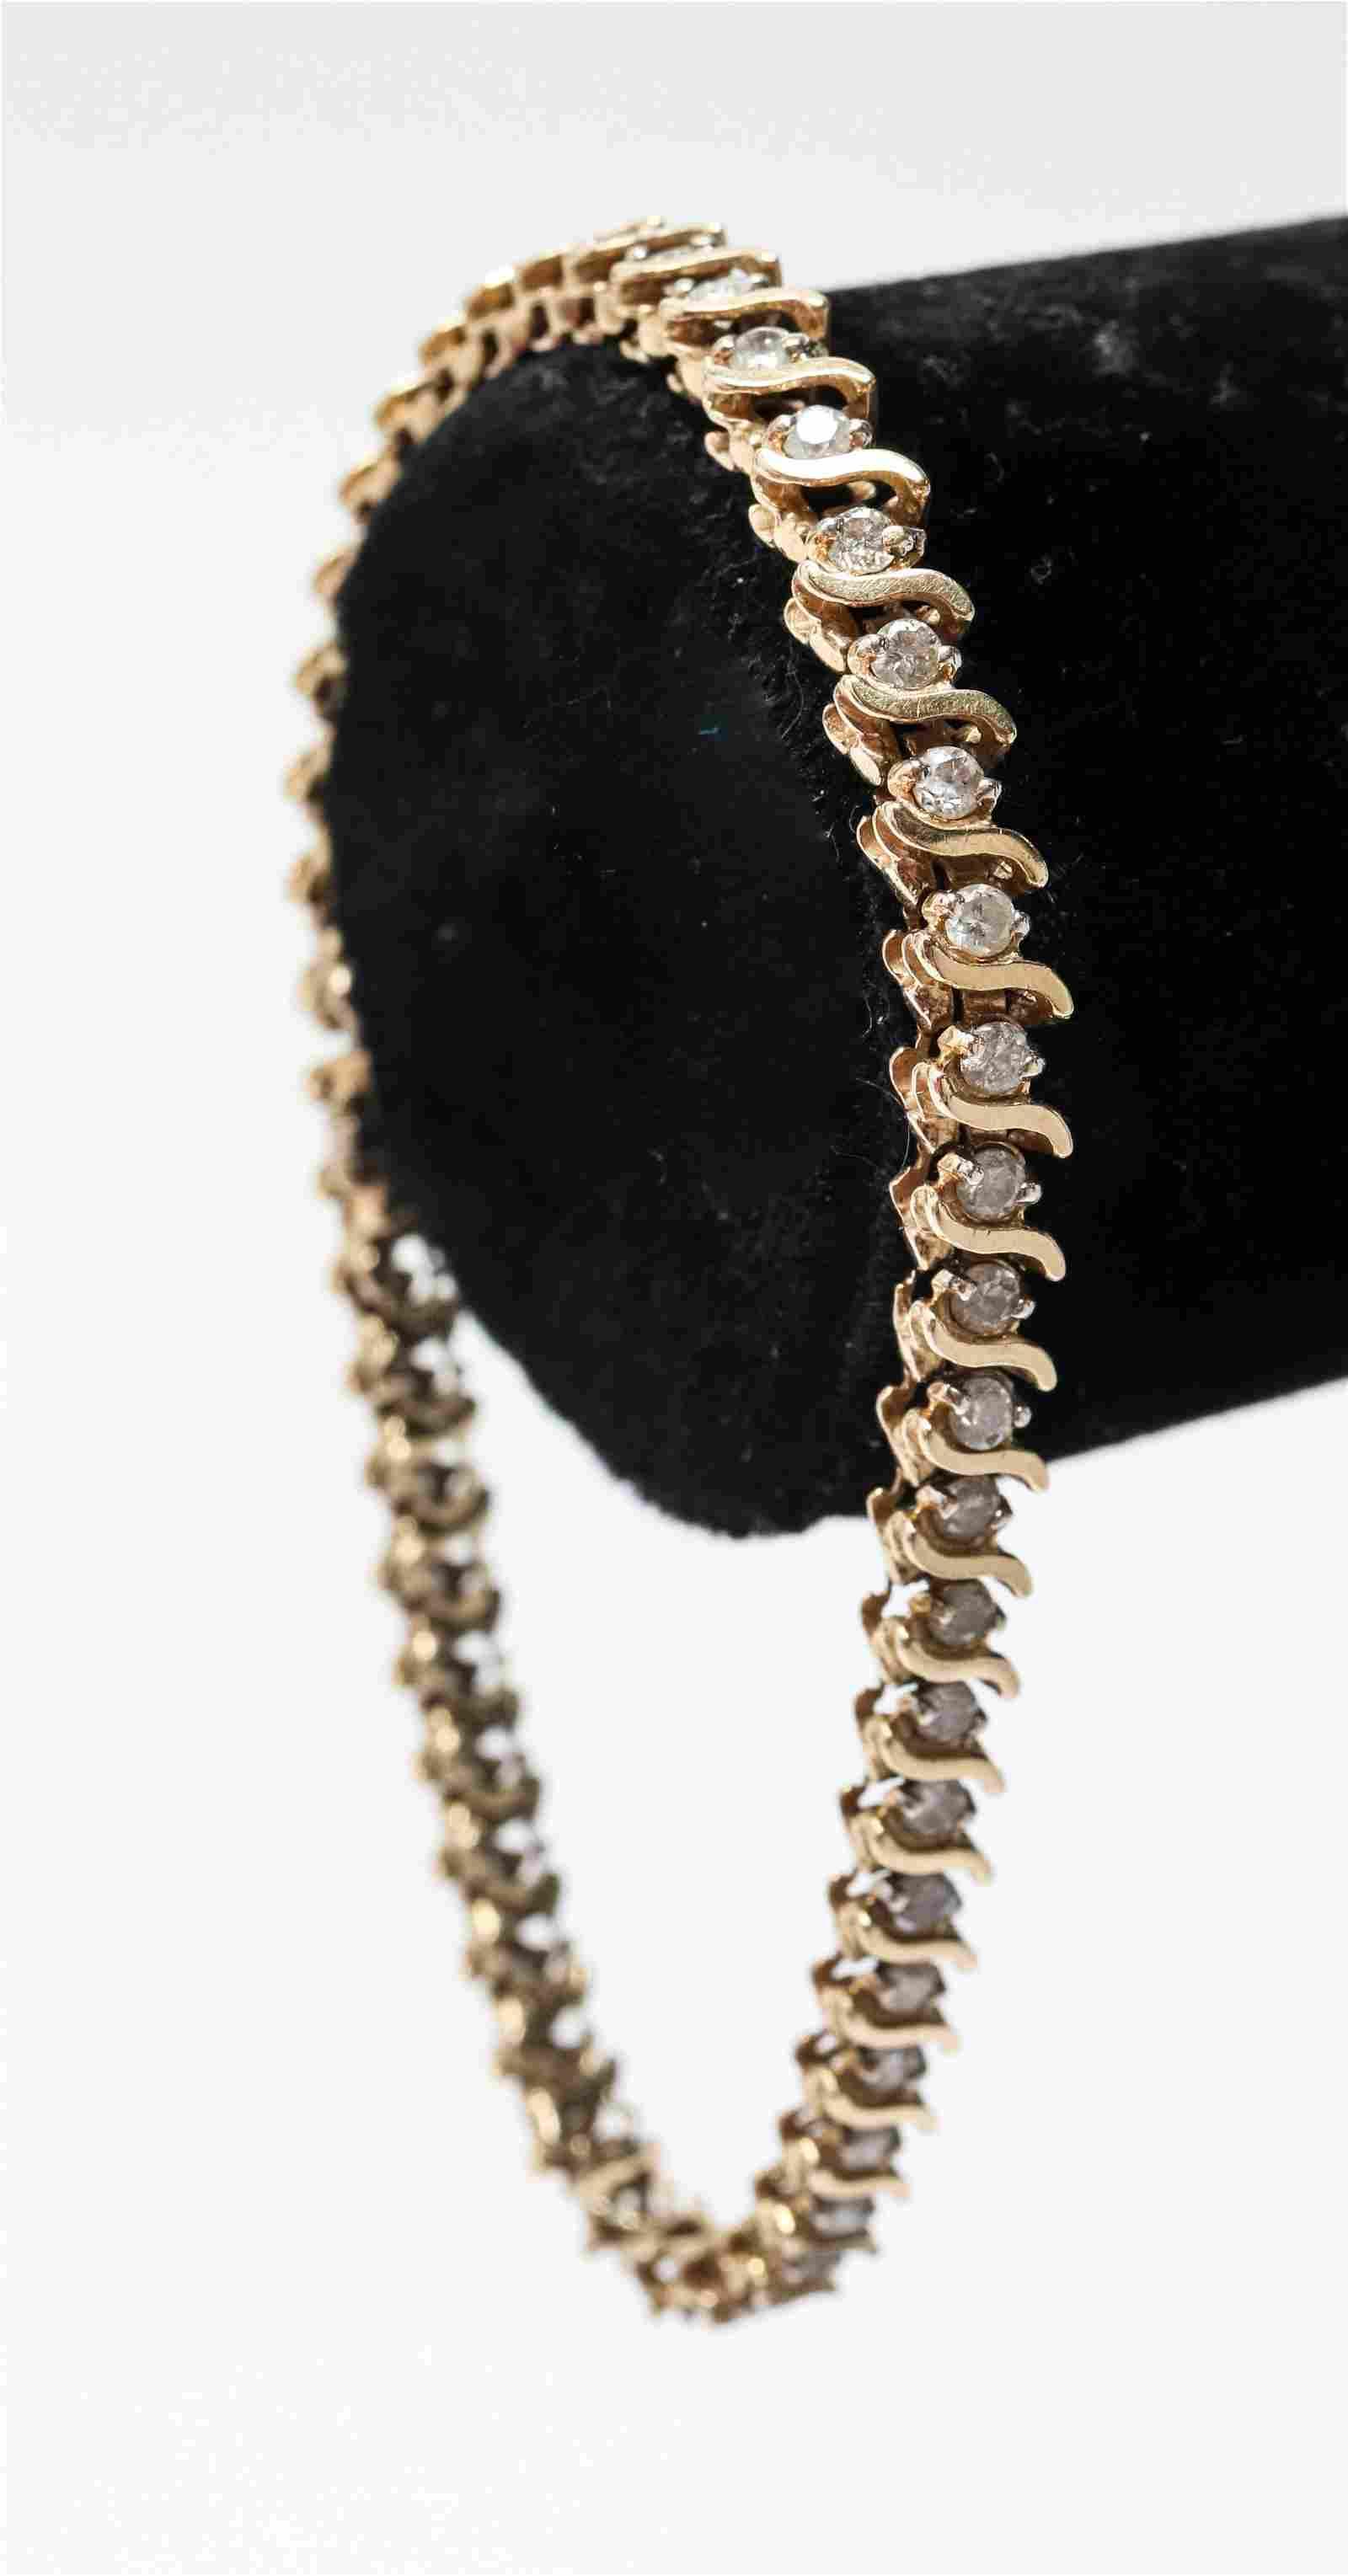 14K Yellow Gold & Diamond S-Link Tennis Bracelet